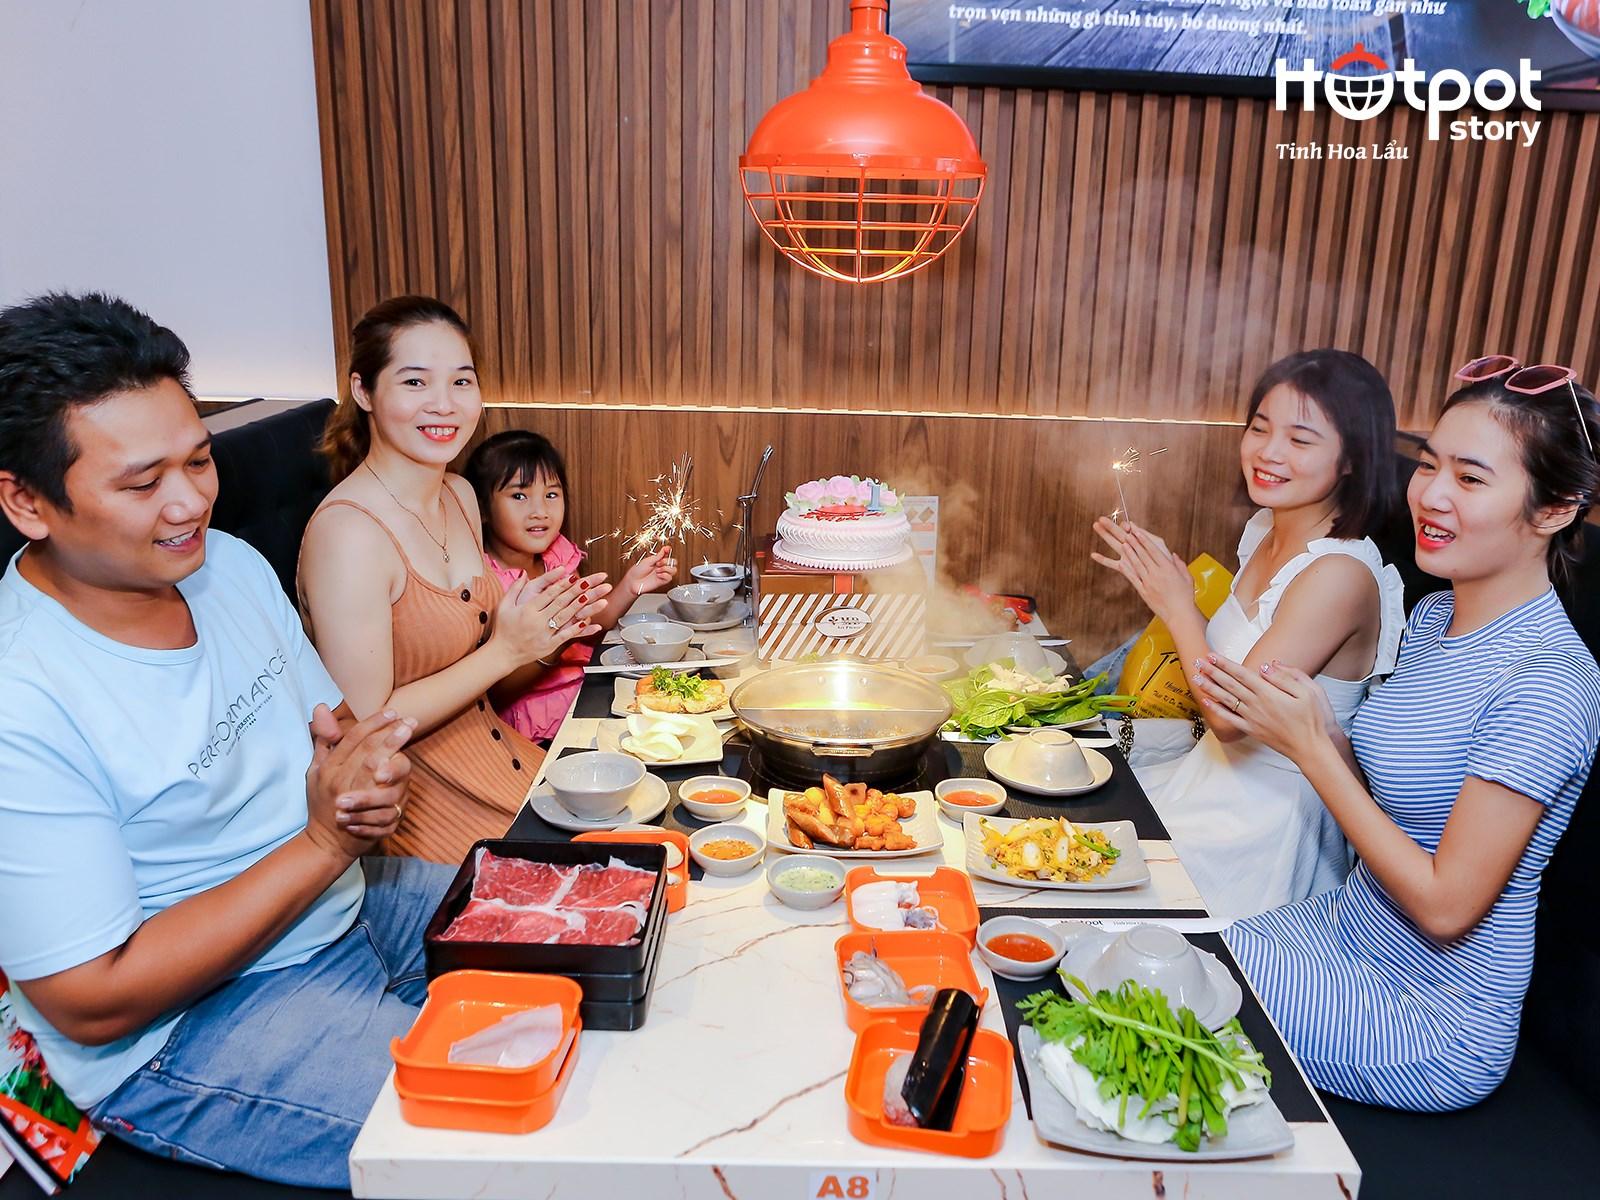 Thuong thuc bua an tai Hotpot Story Ha Noi